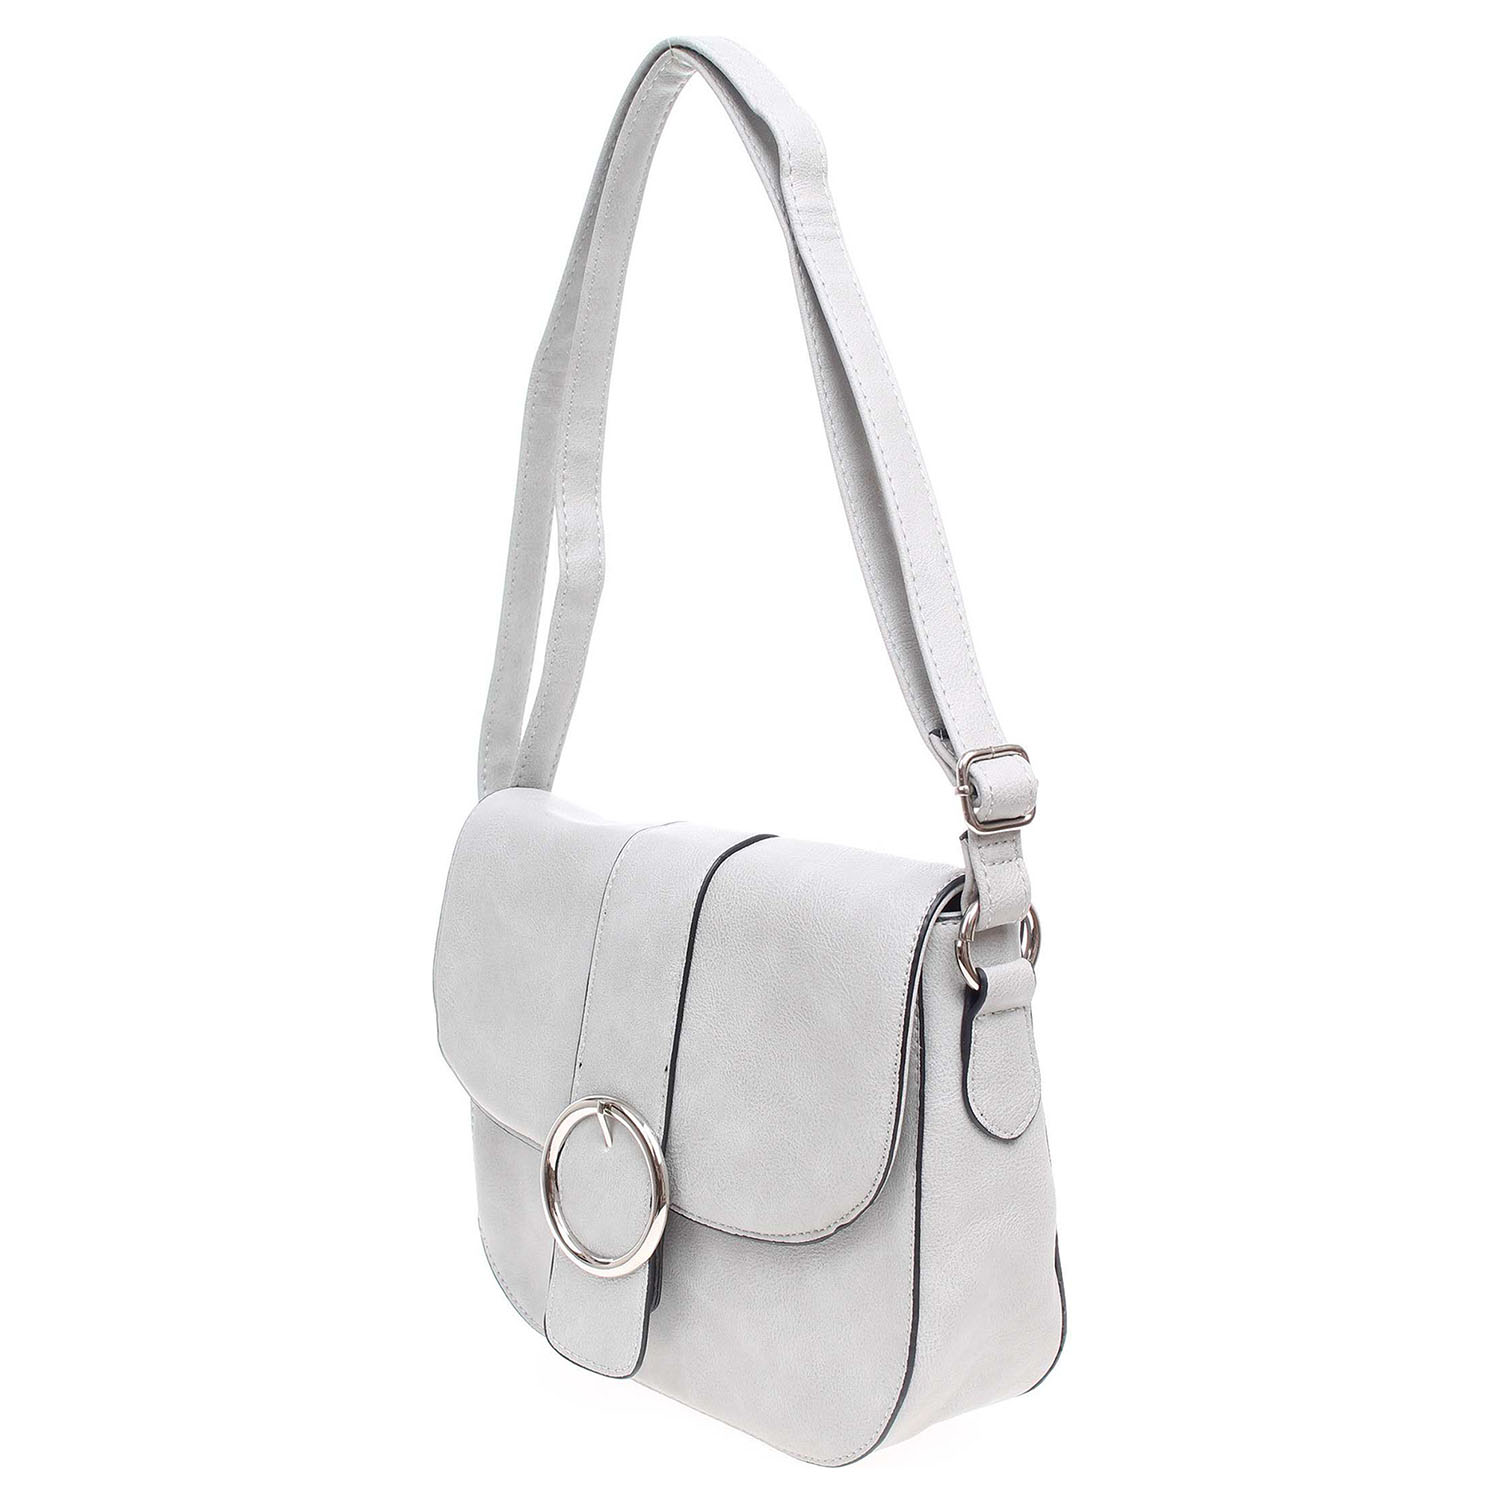 Ecco Dámská kabelka J821PC šedá 11891194